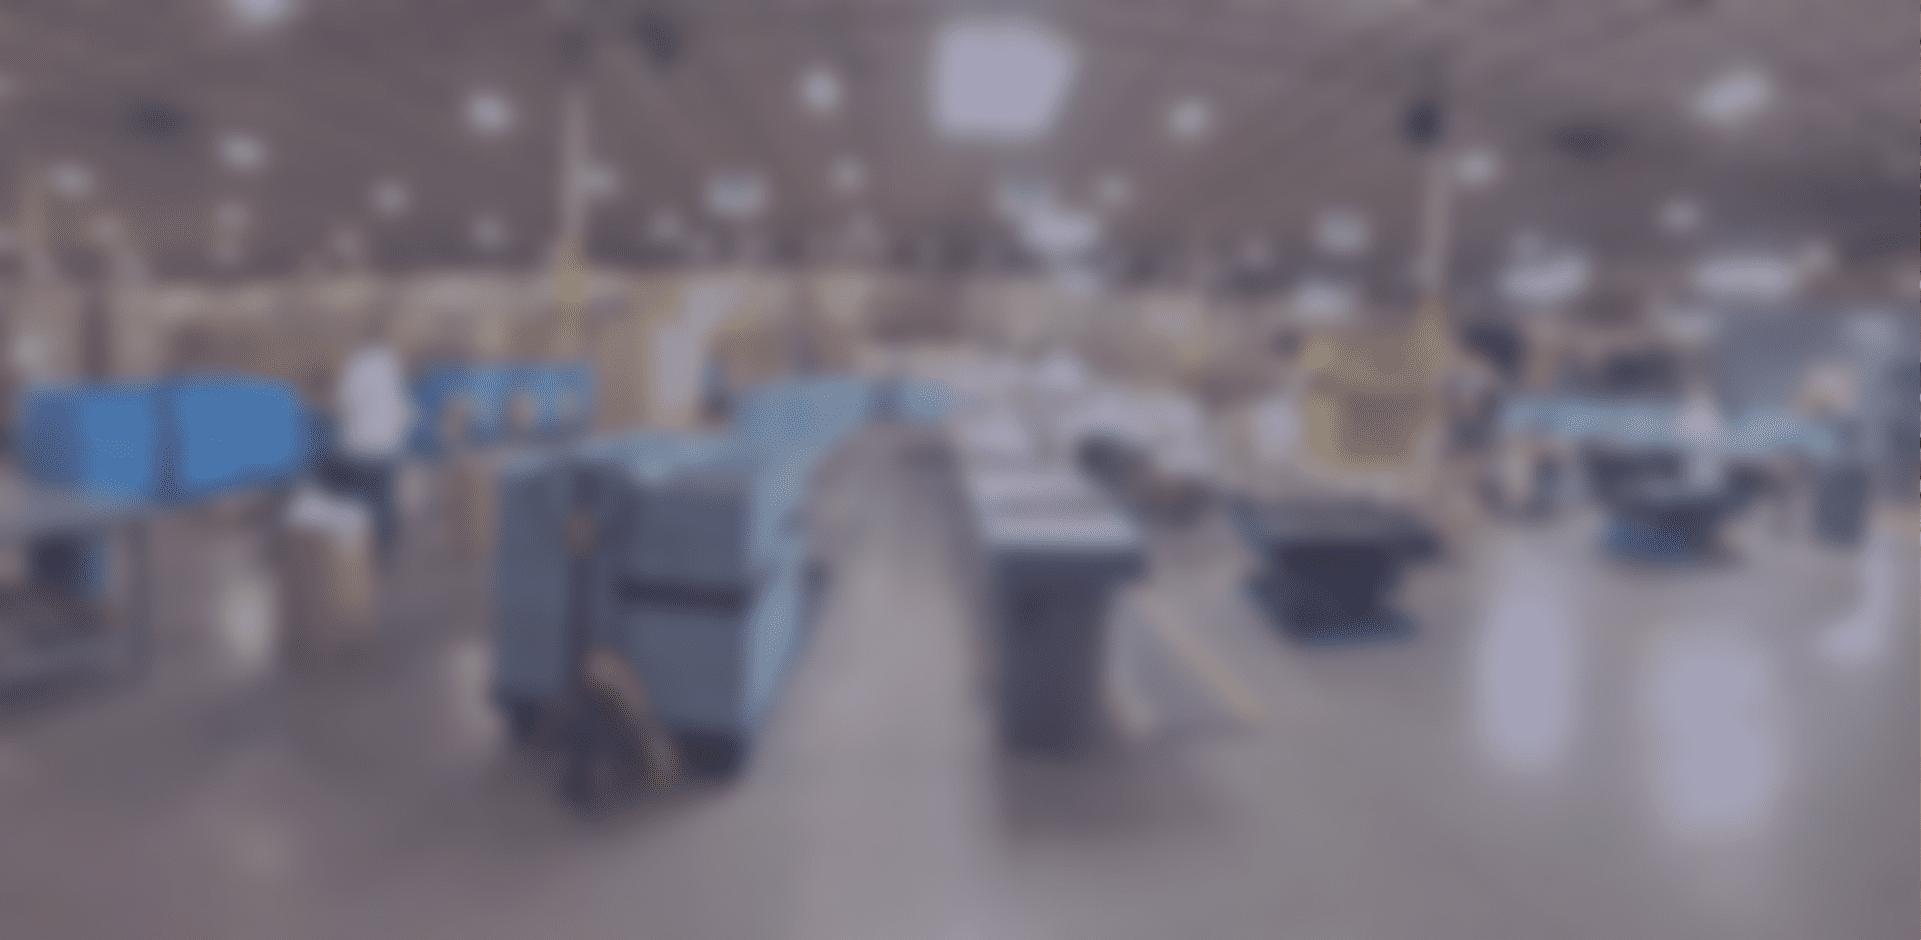 warehousing and logistics